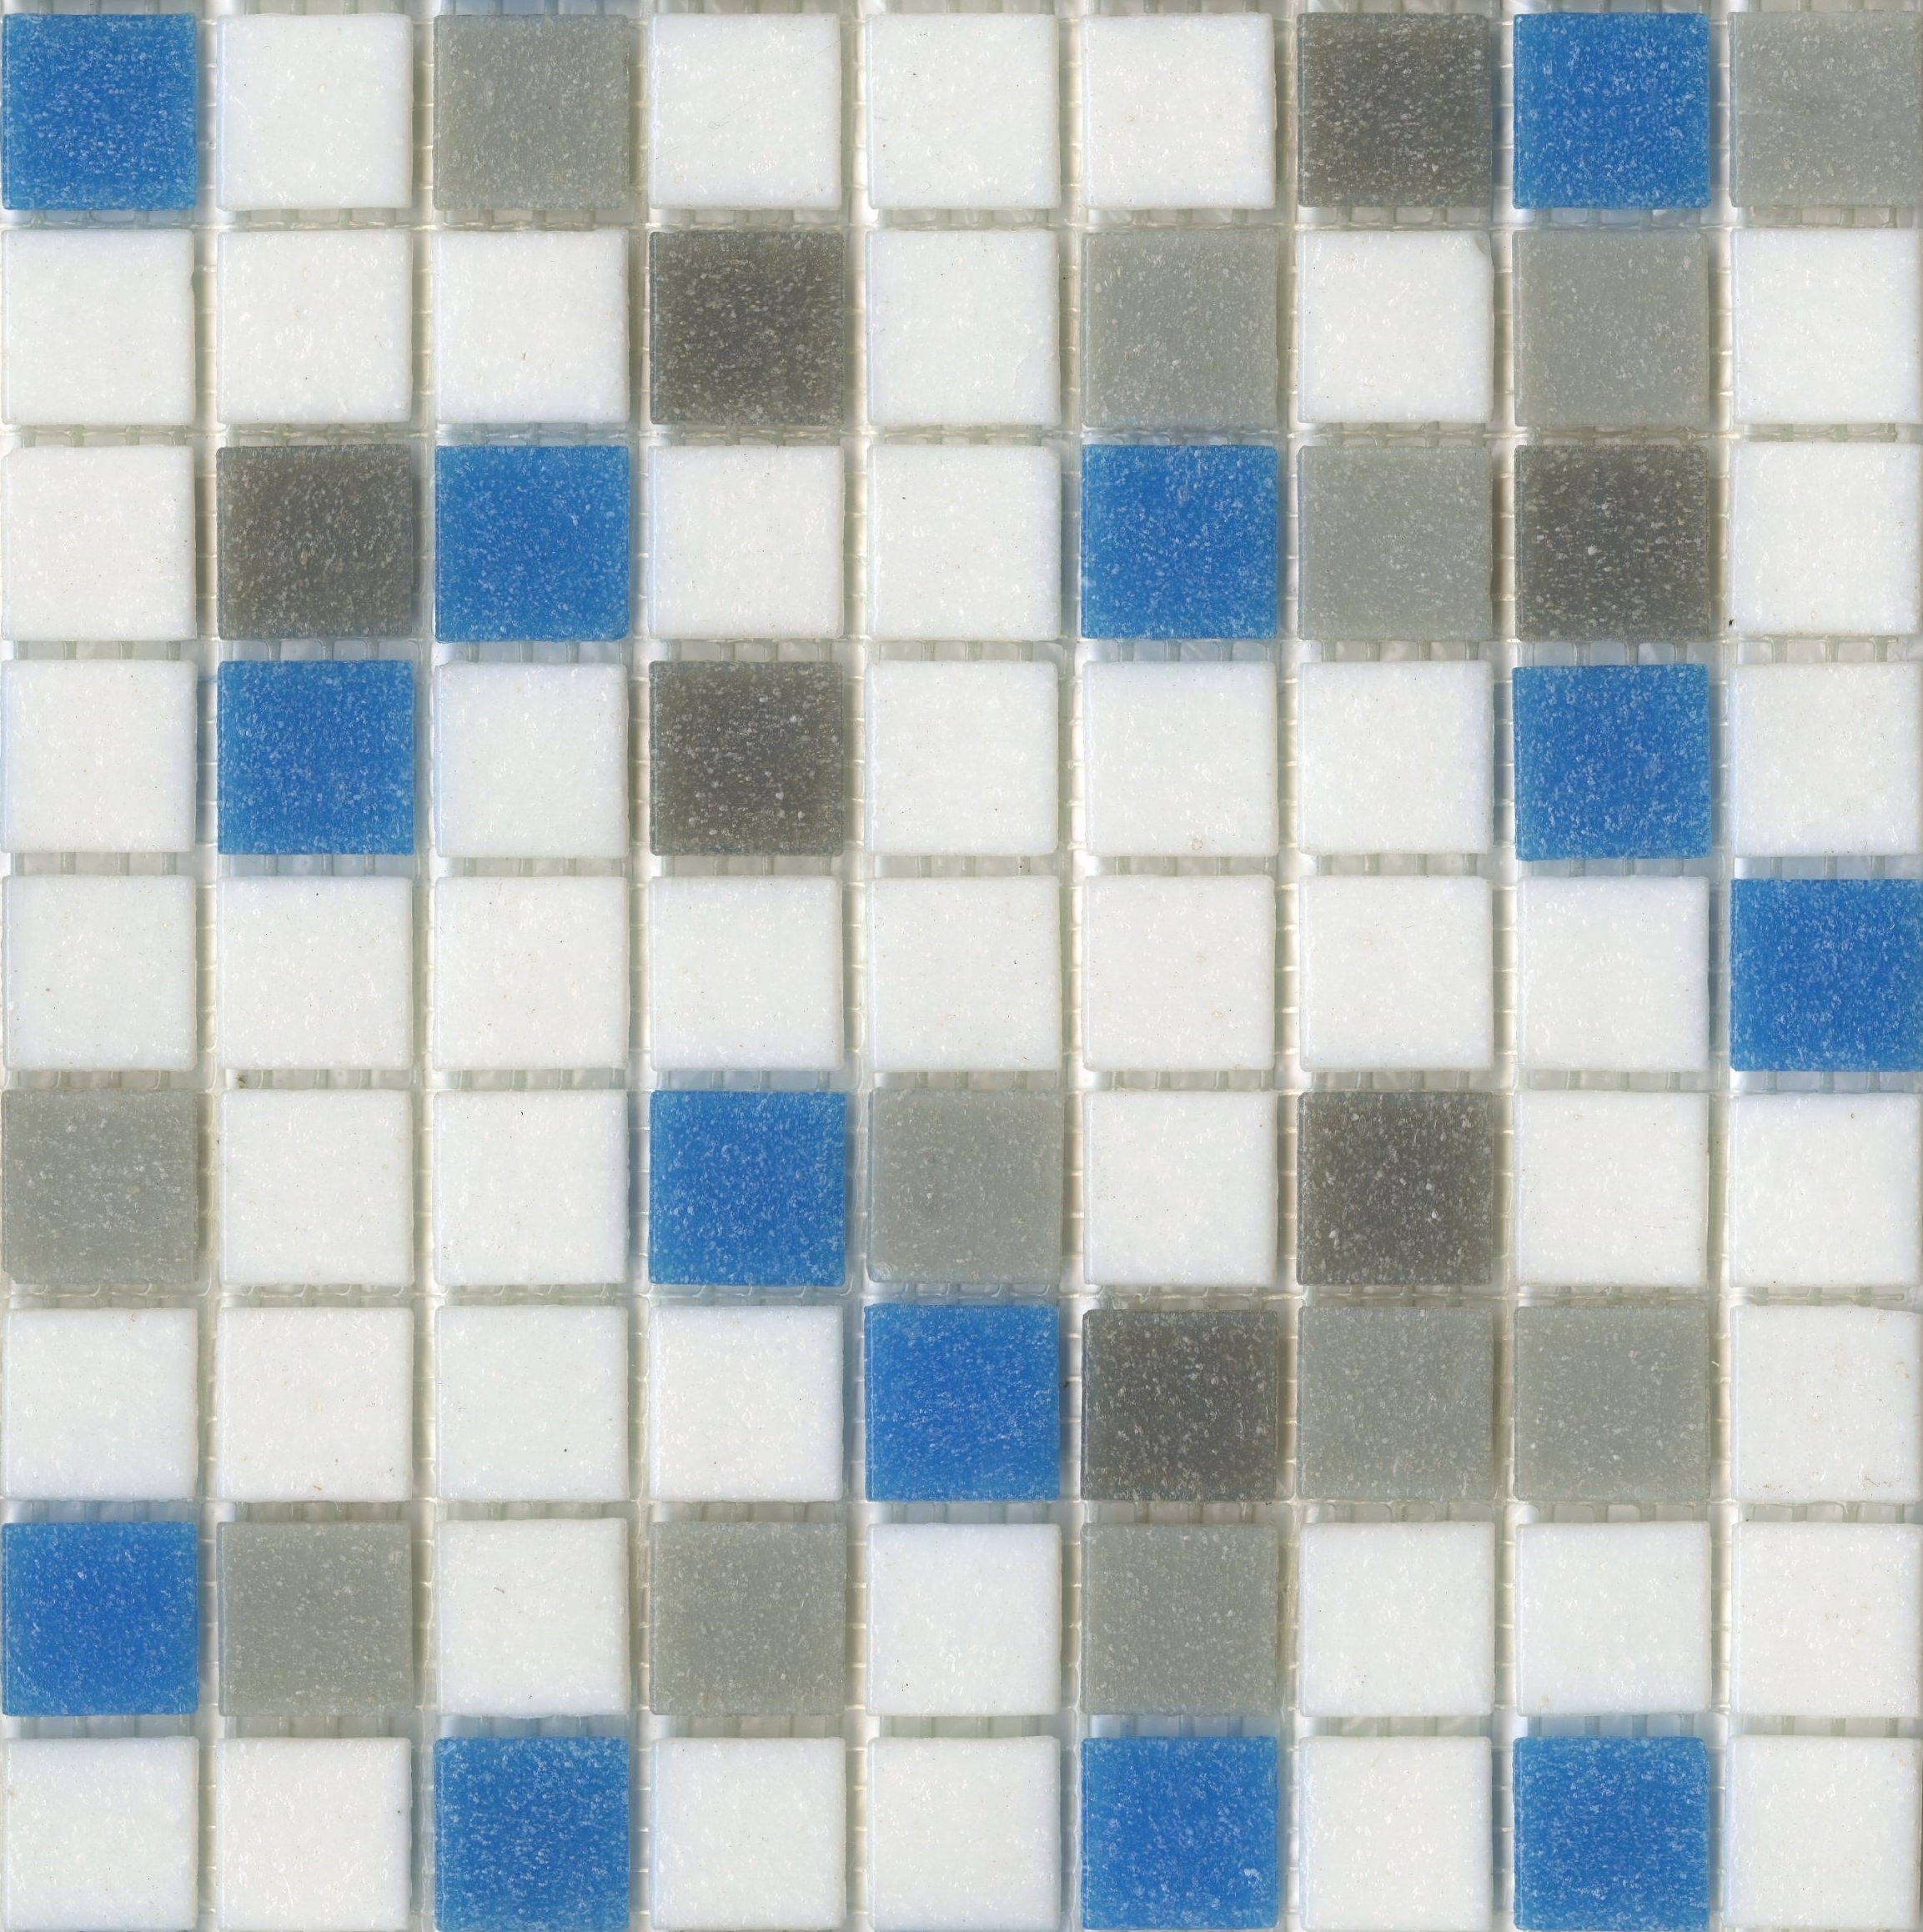 Brio Blend Urban Sky - Glass Mosaic Tile | Pinterest | Bathroom ...